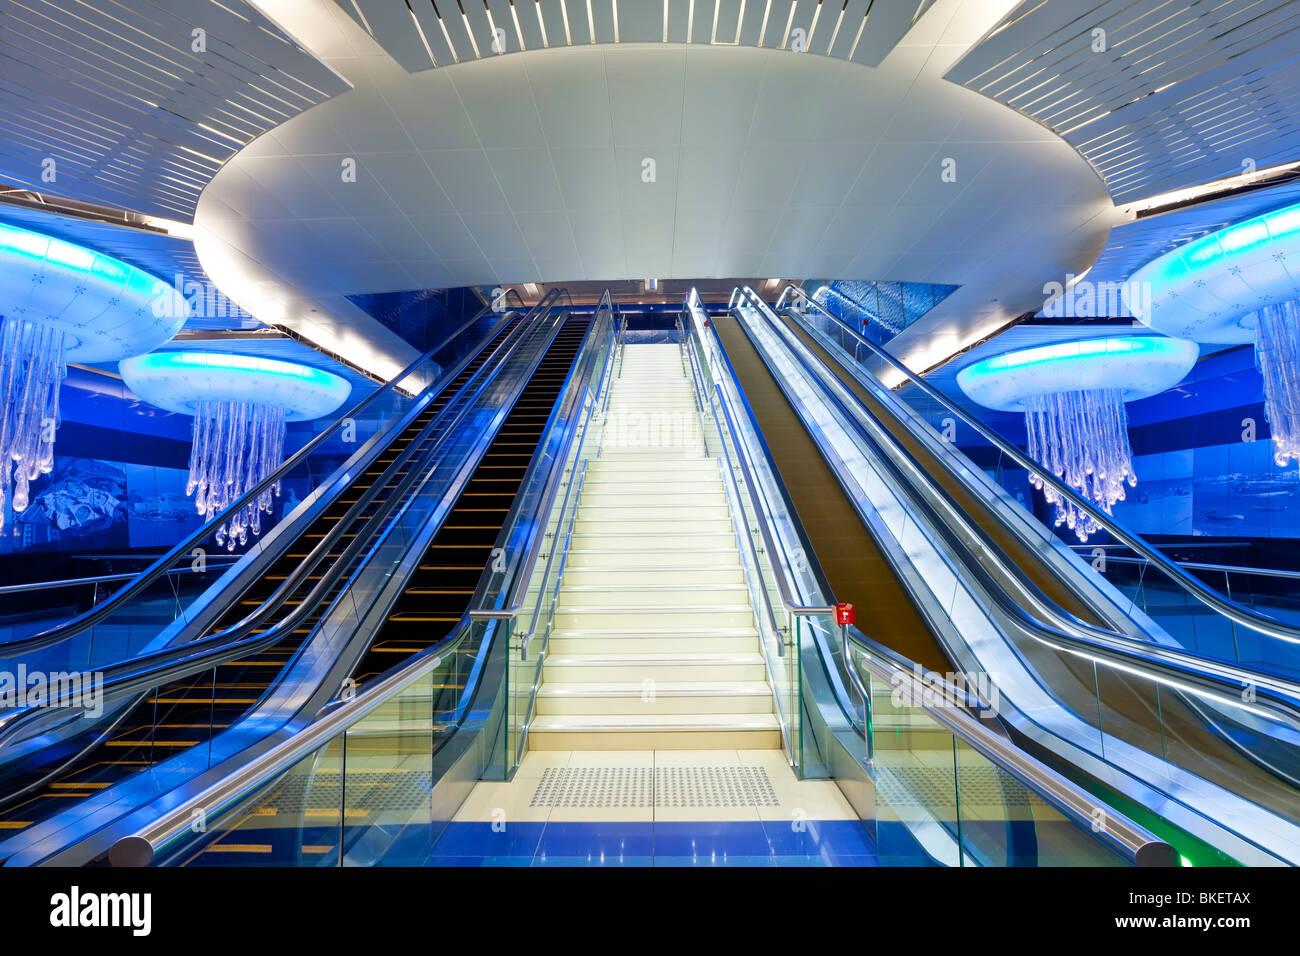 Dubai Metro station, Modern Interior Design, opened in 2010, Dubai, UAE, United Arab Emirates - Stock Image